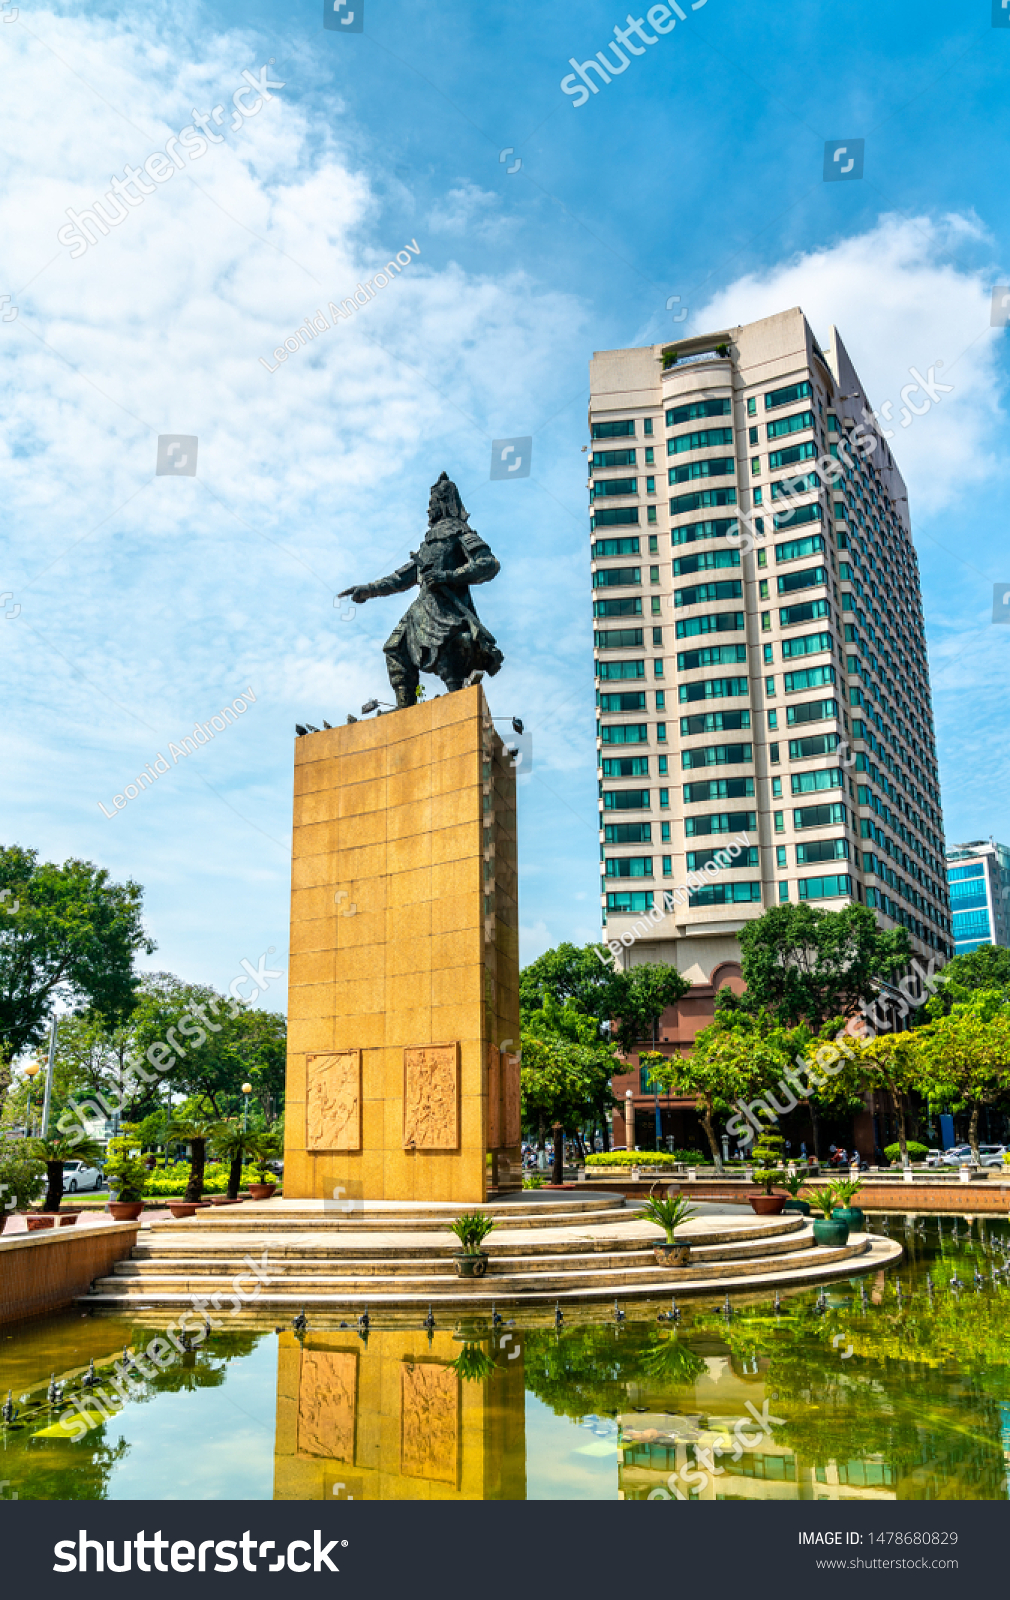 Tran Hung Dao Statue On Me Buildings Landmarks Stock Image 1478680829